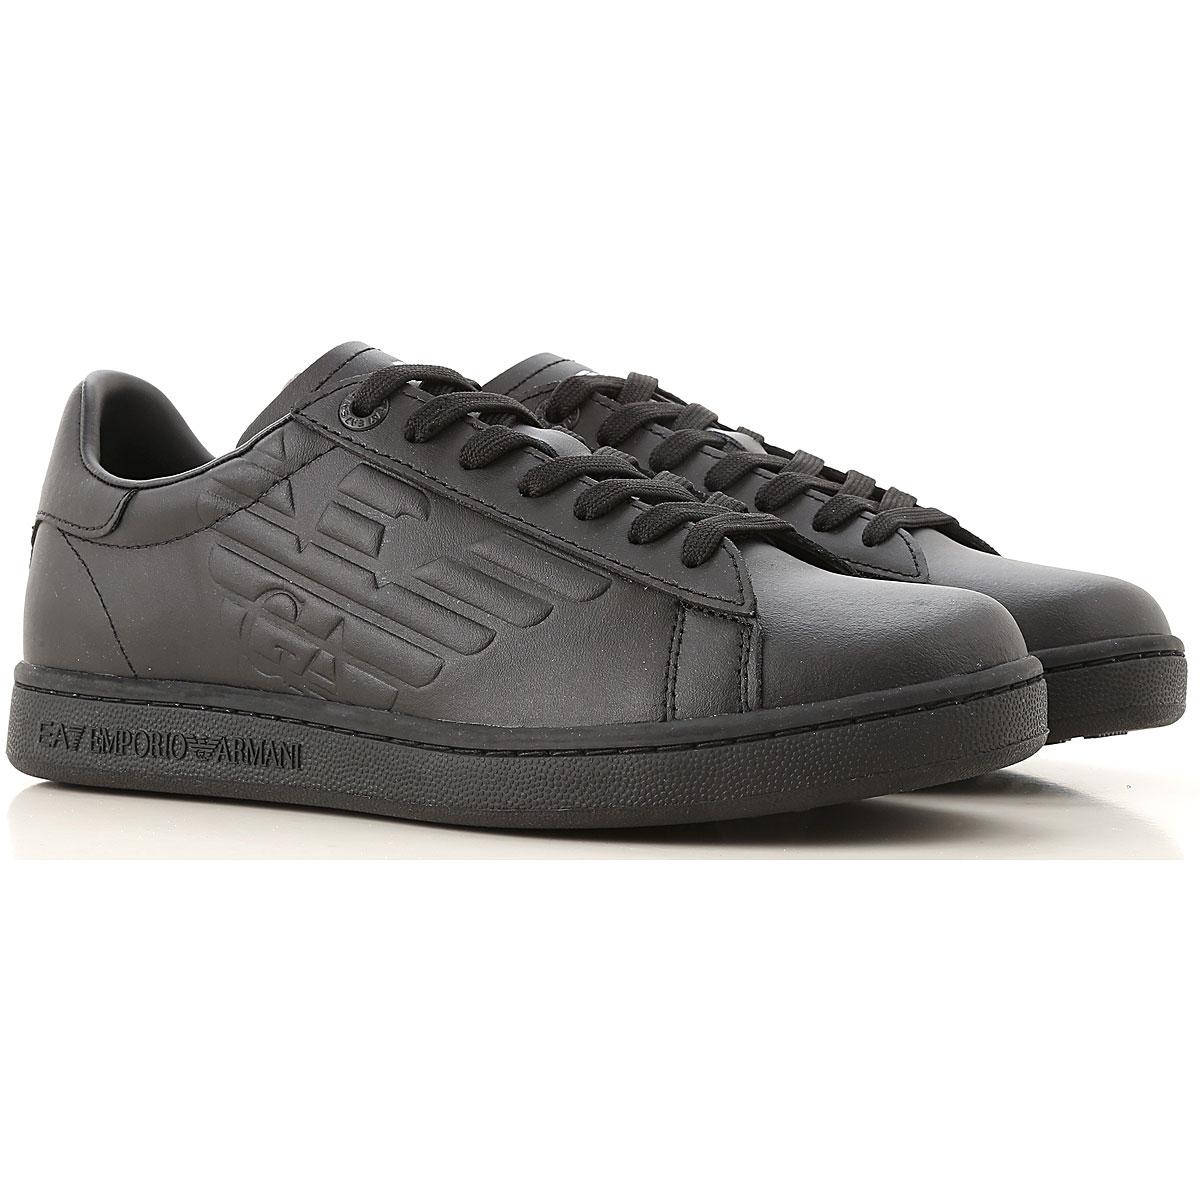 09365de2 Mens Shoes Emporio Armani, Style code: x8x001-xcc51-a083